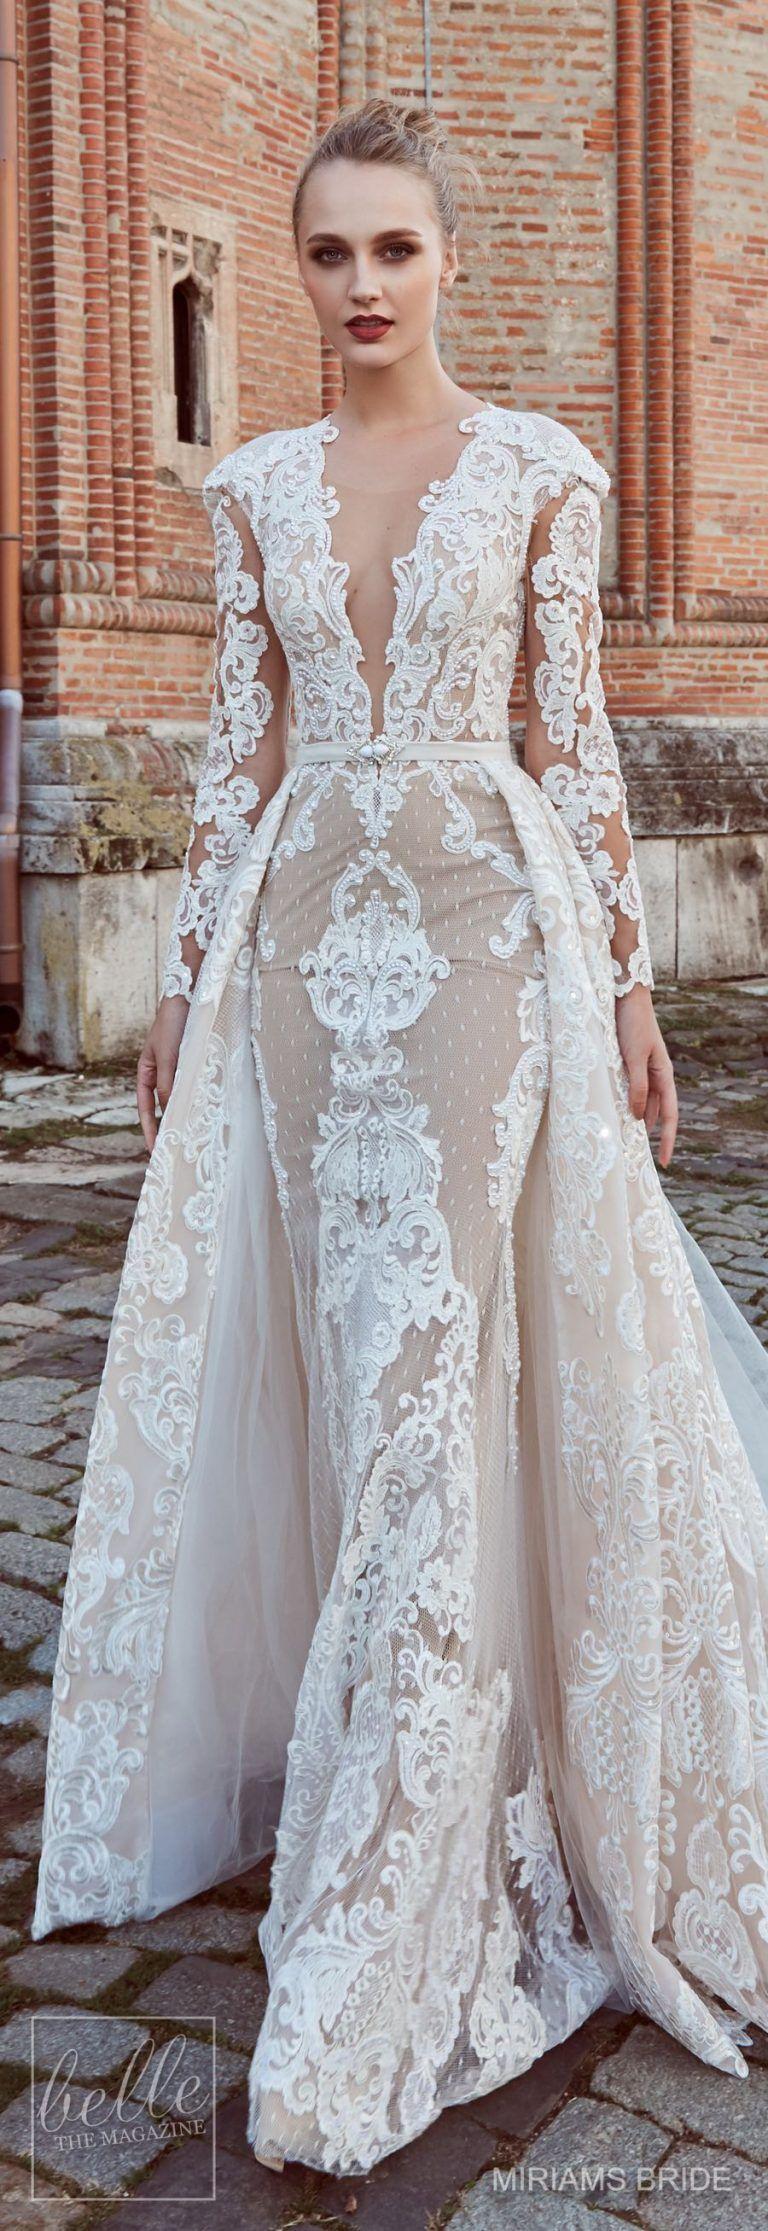 Bridal Trends: Non Strapless Wedding Dresses - Belle The Magazine ...